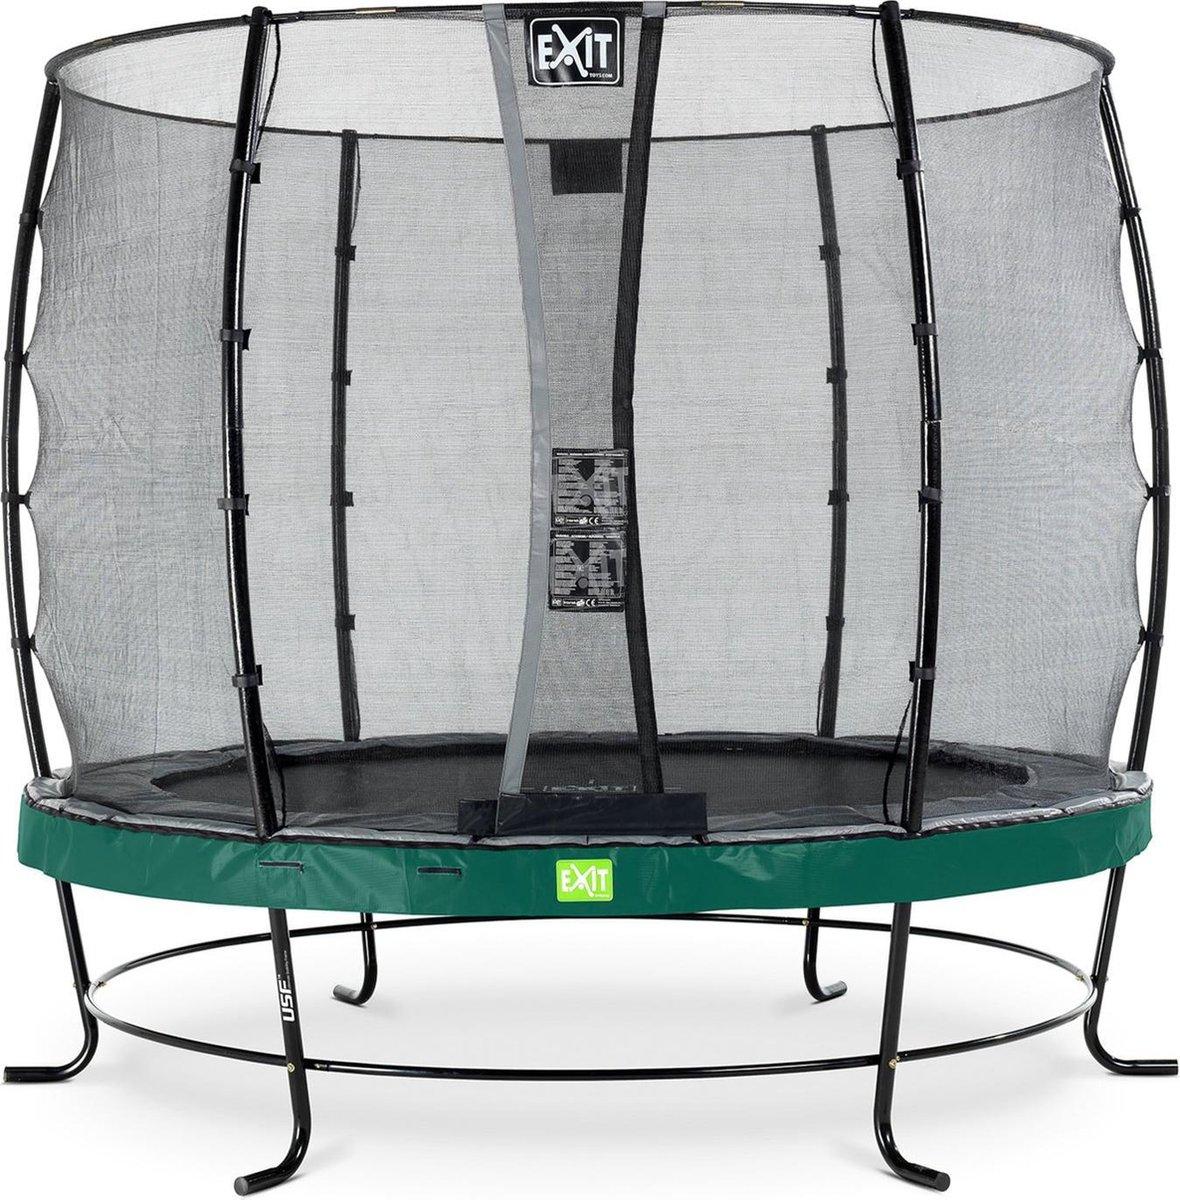 Trampoline EXIT Elegant - ø253cm met net Economy - groen